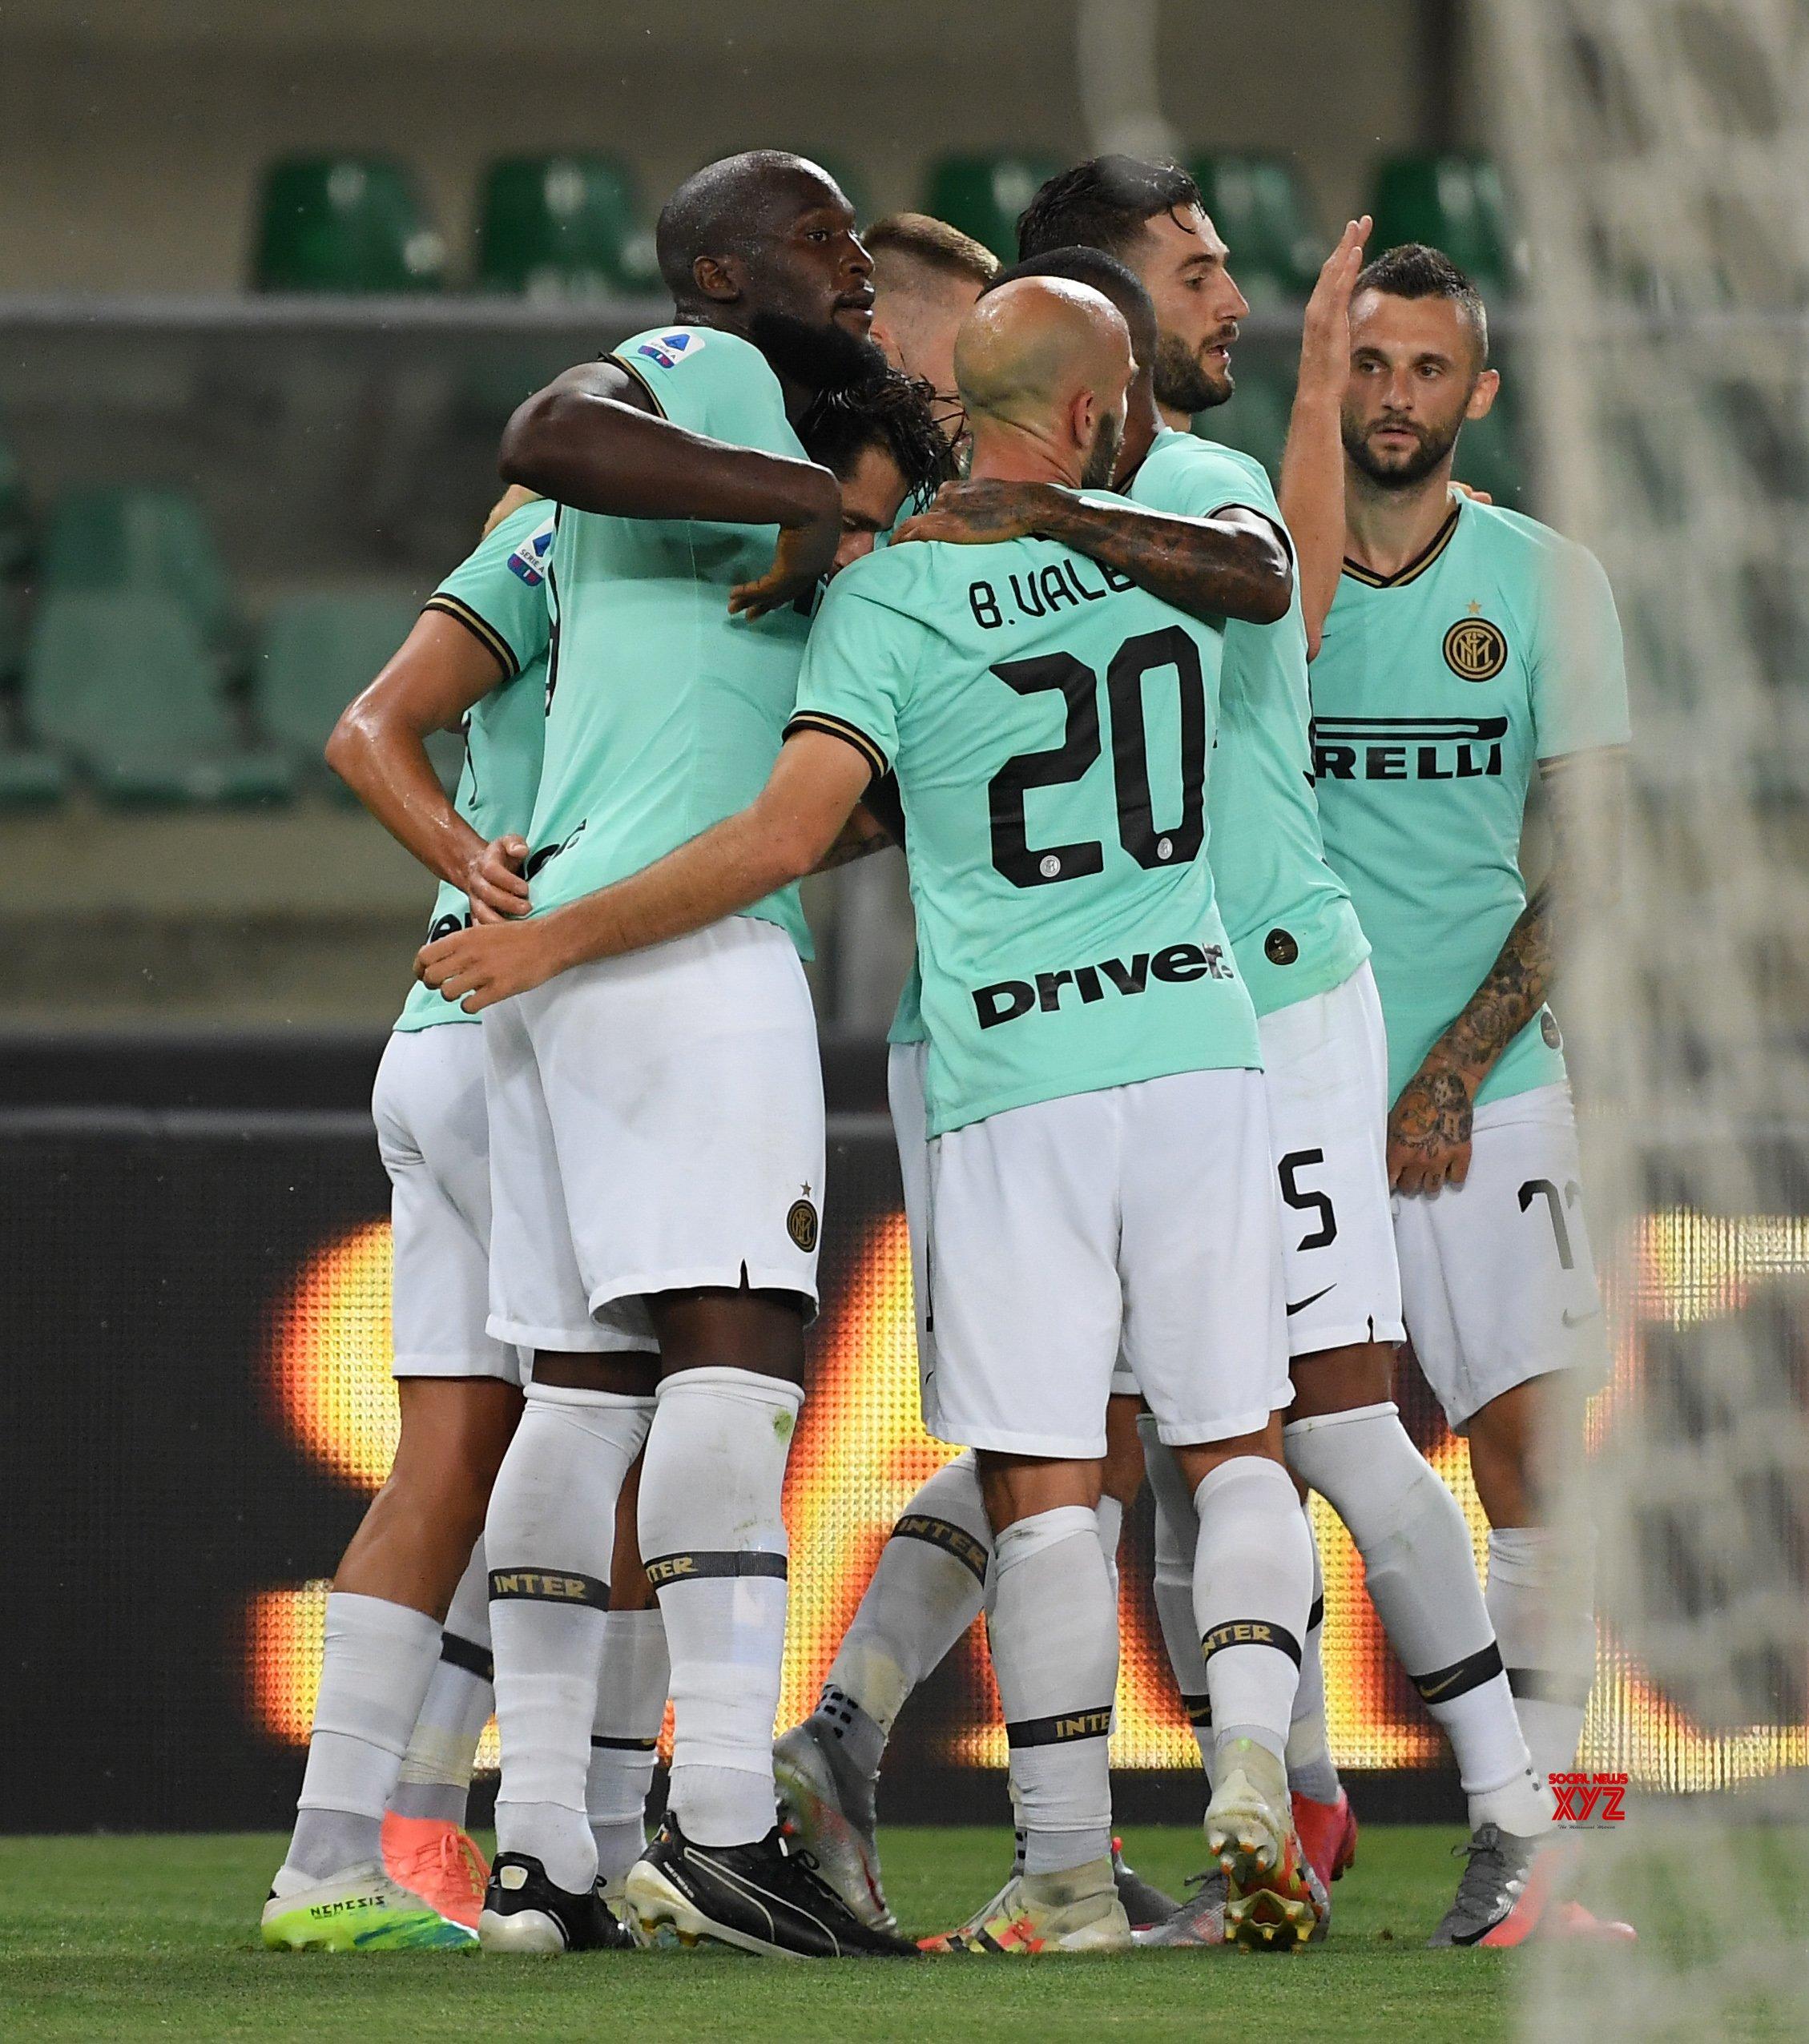 Italy Verona Soccer Serie A Hellas Verona Vs Inter Milan Gallery Social News Xyz